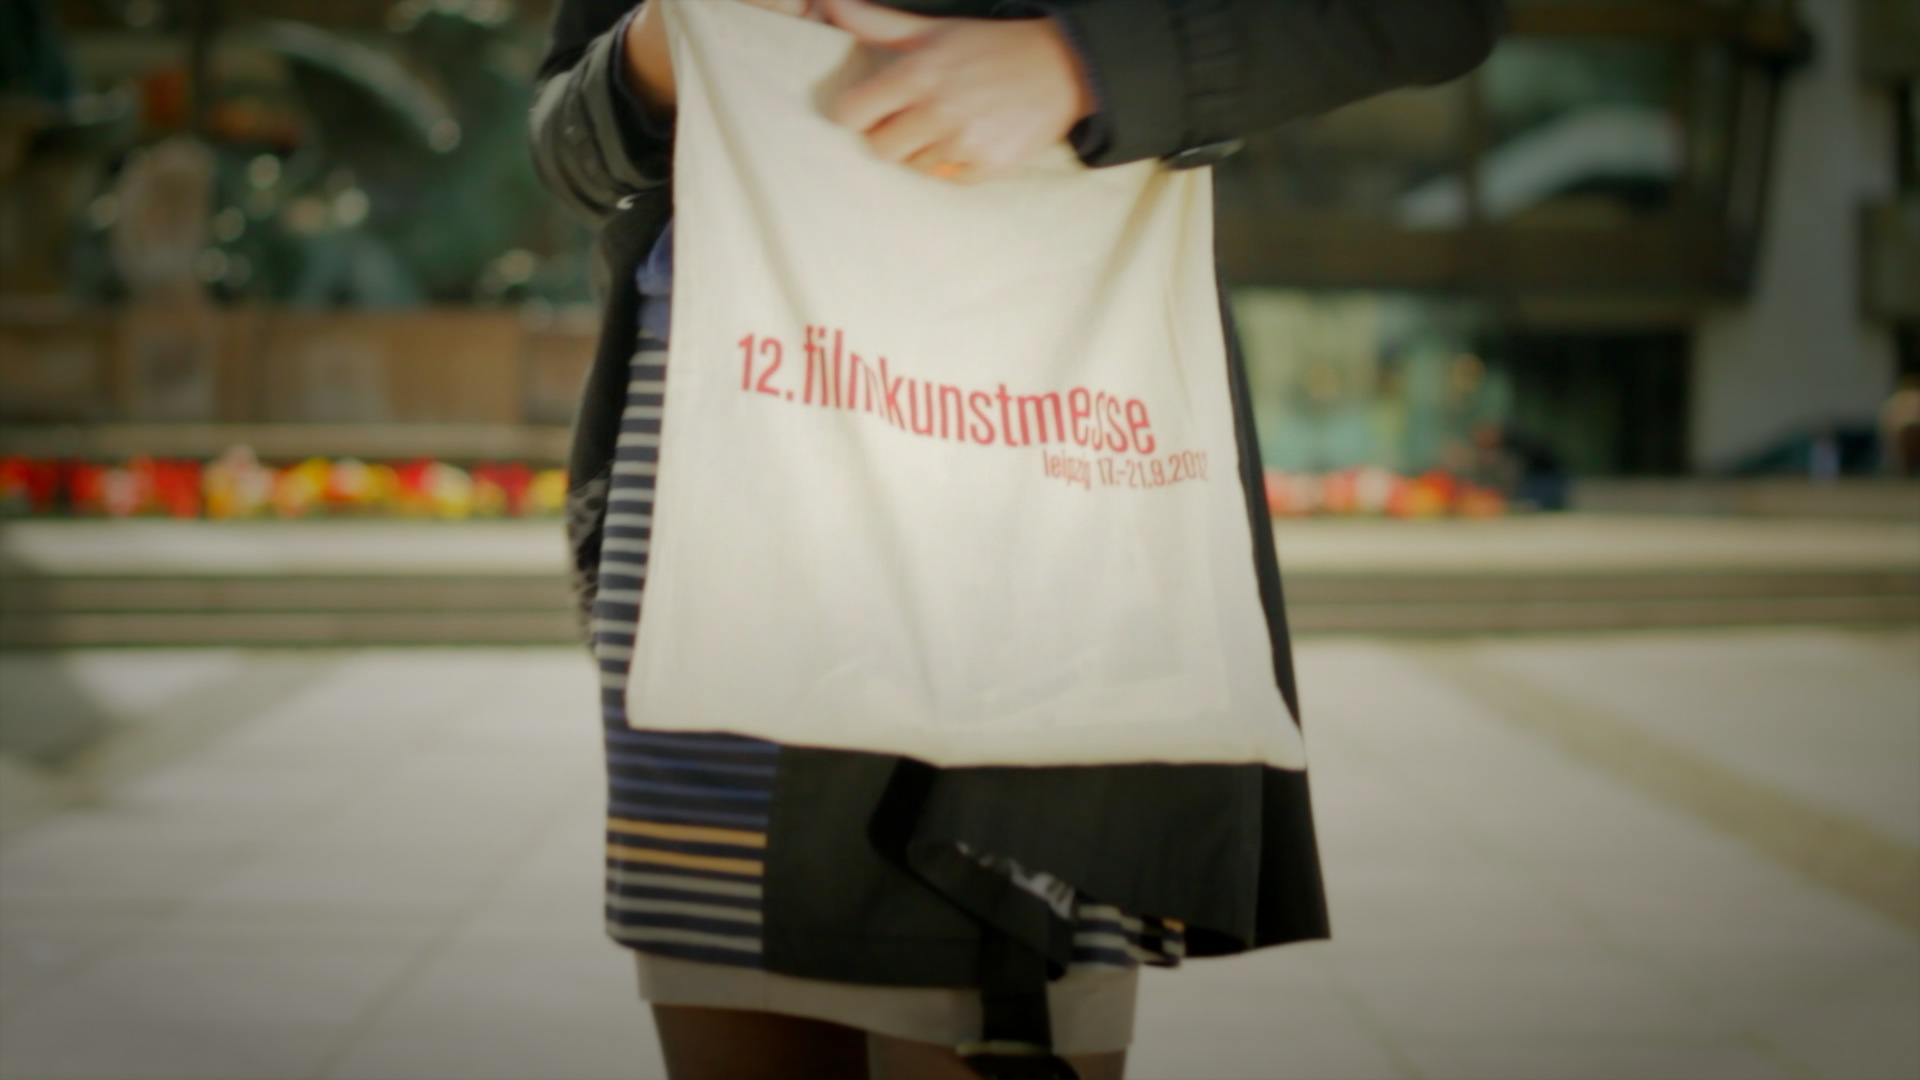 Filmkunstmesse Leipzig Tasche